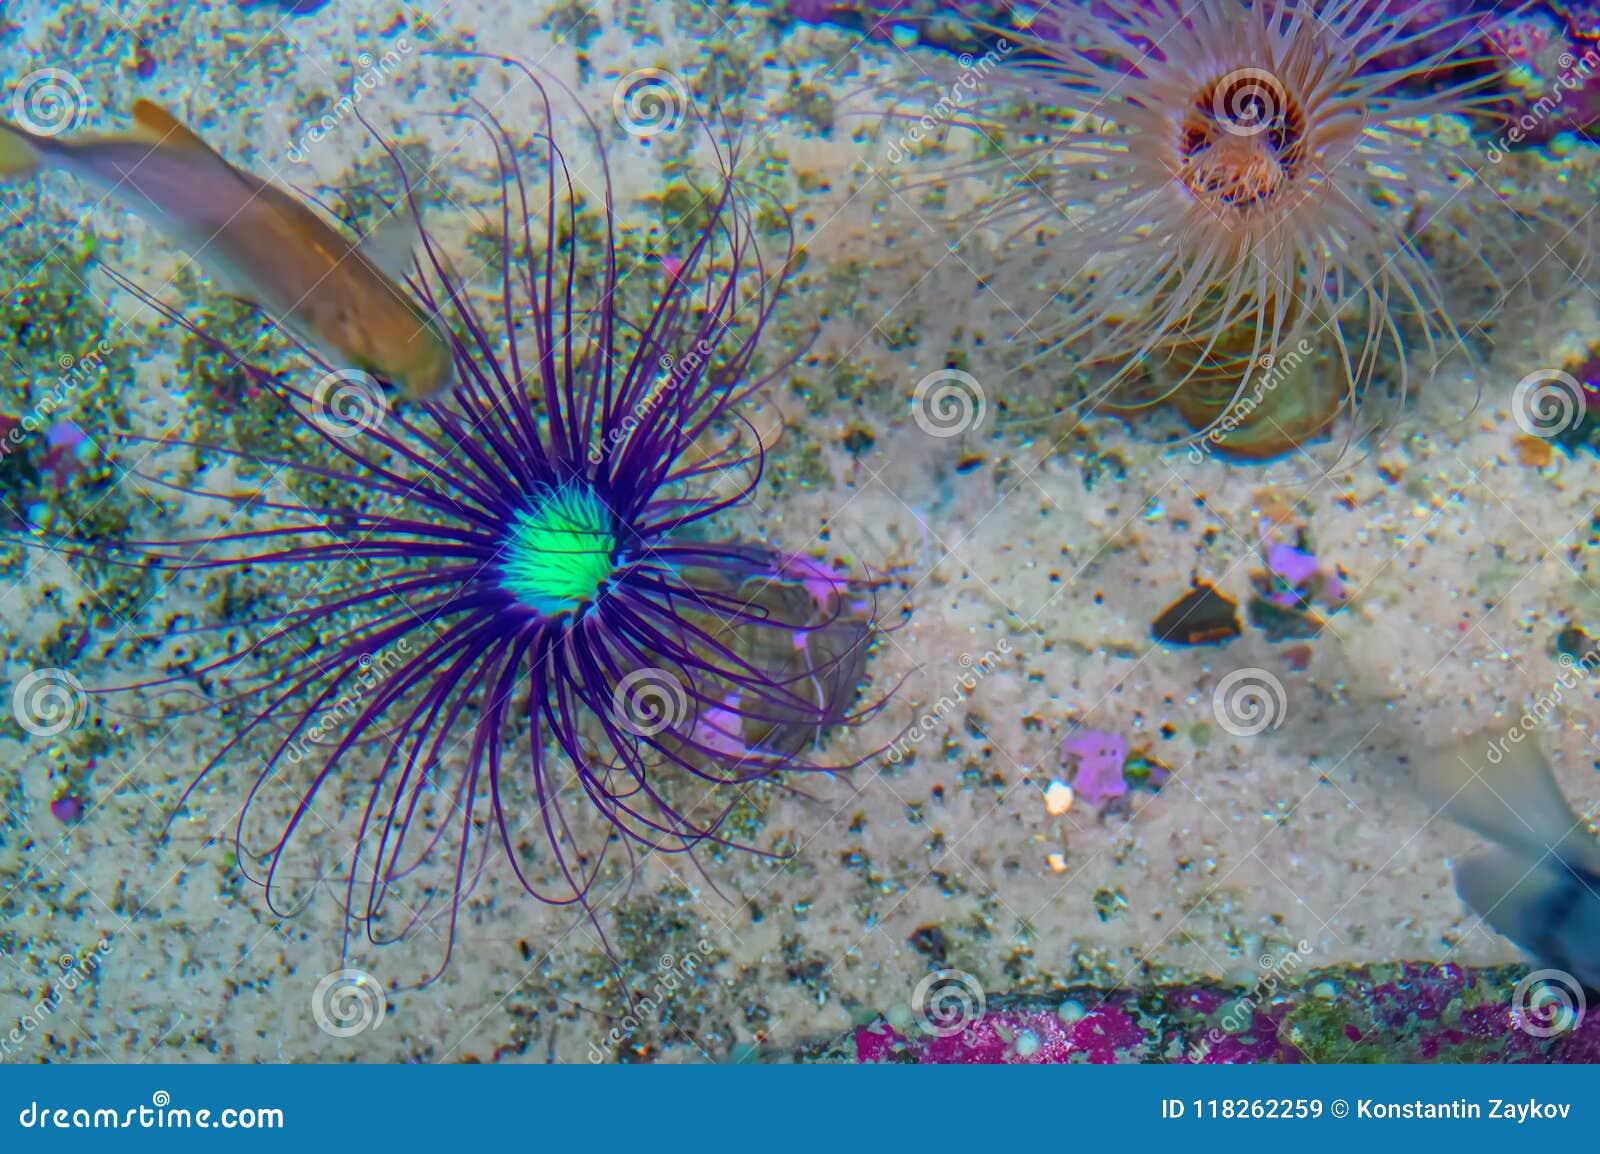 Sea Anemone Looks A Lot Like Flower Marine Animals On The Sandy Seabed